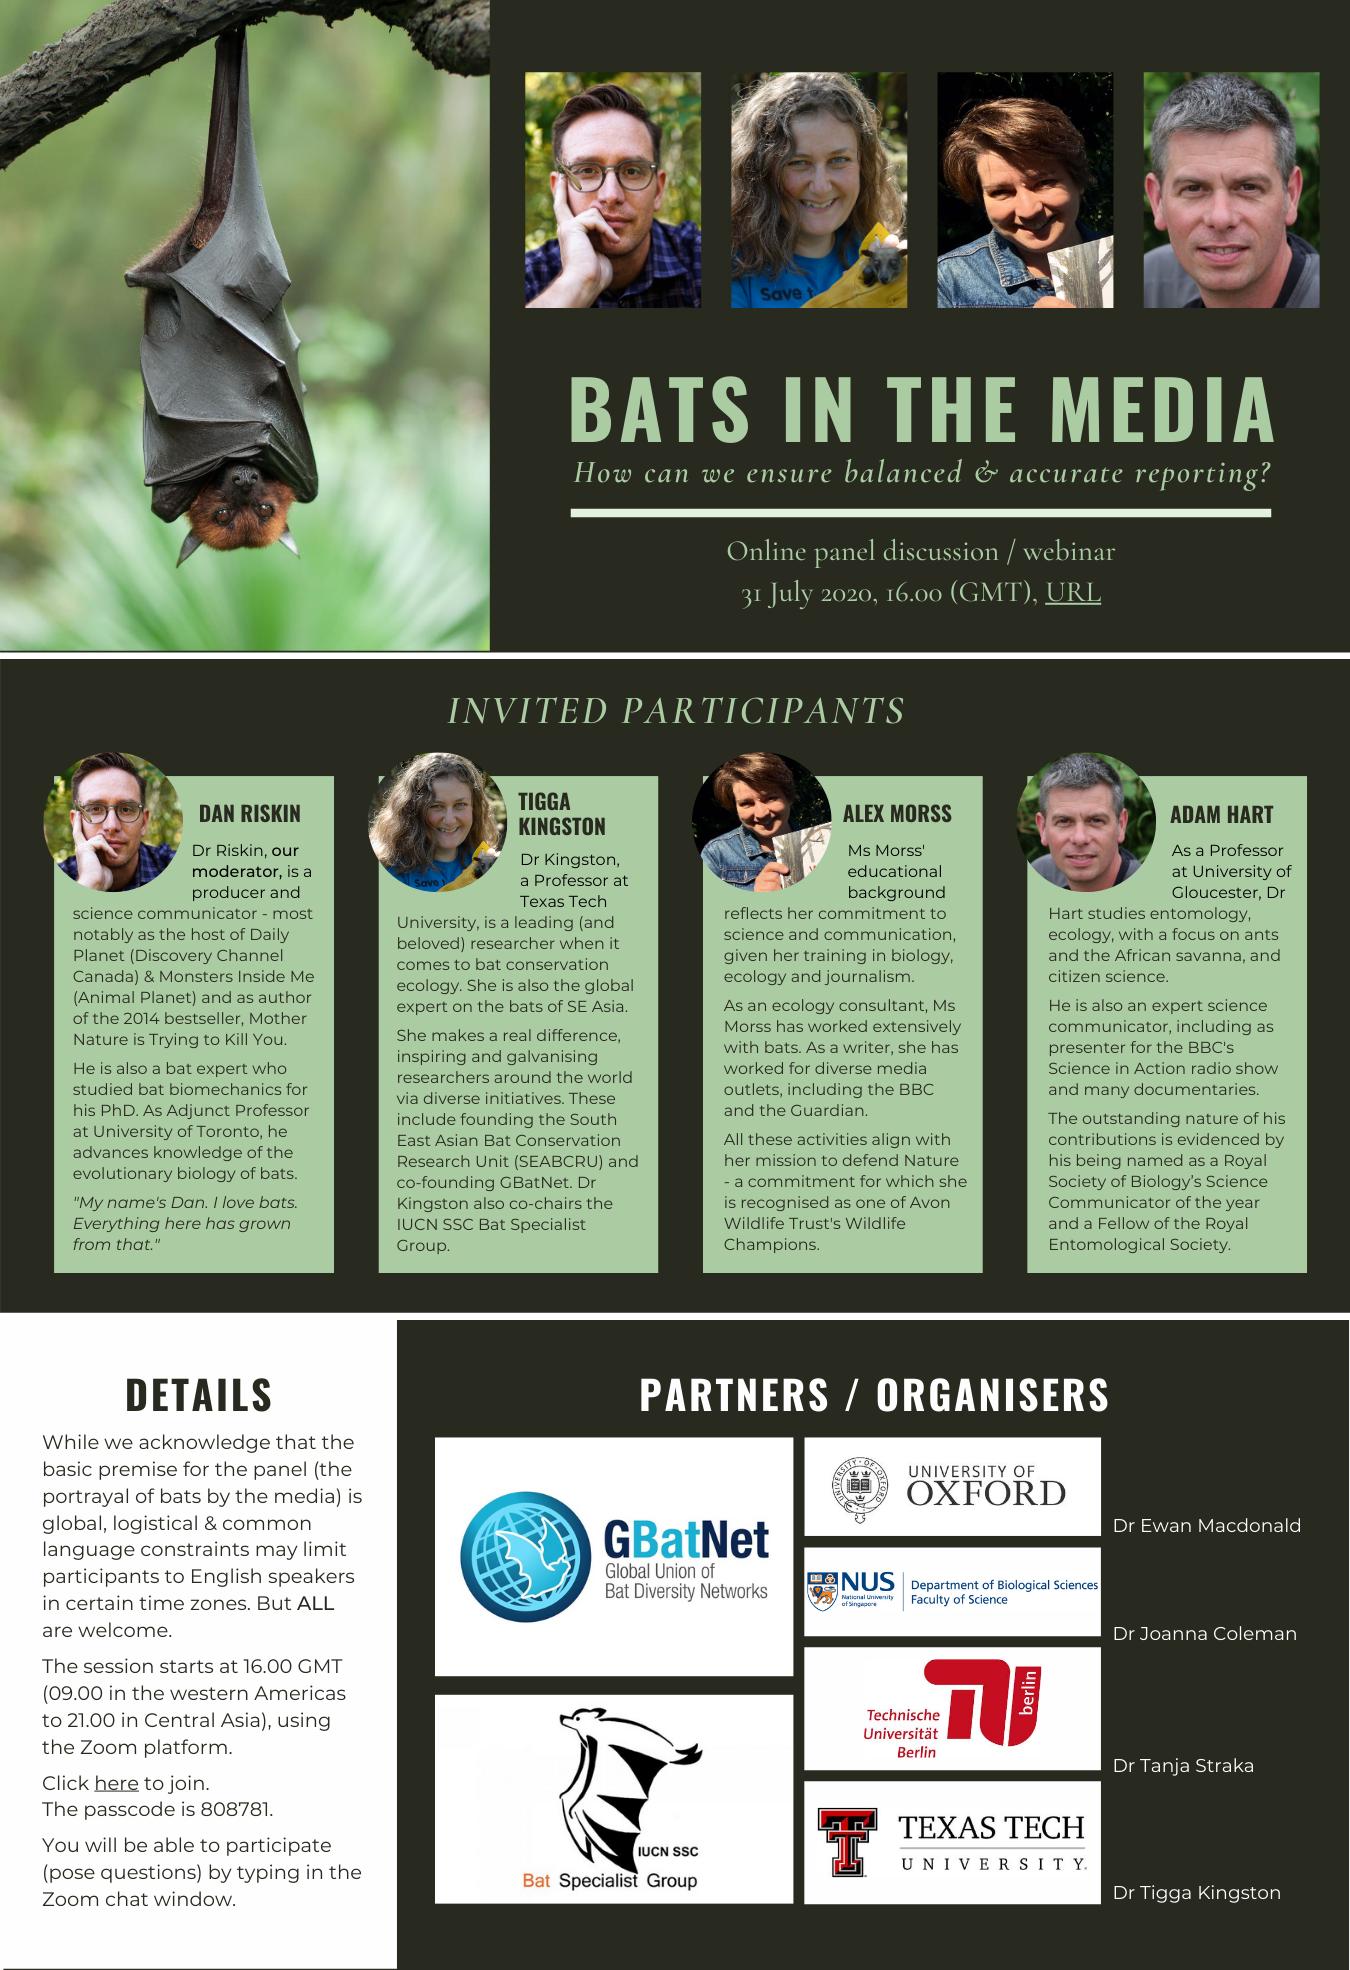 Bats in the Media (July 2020)